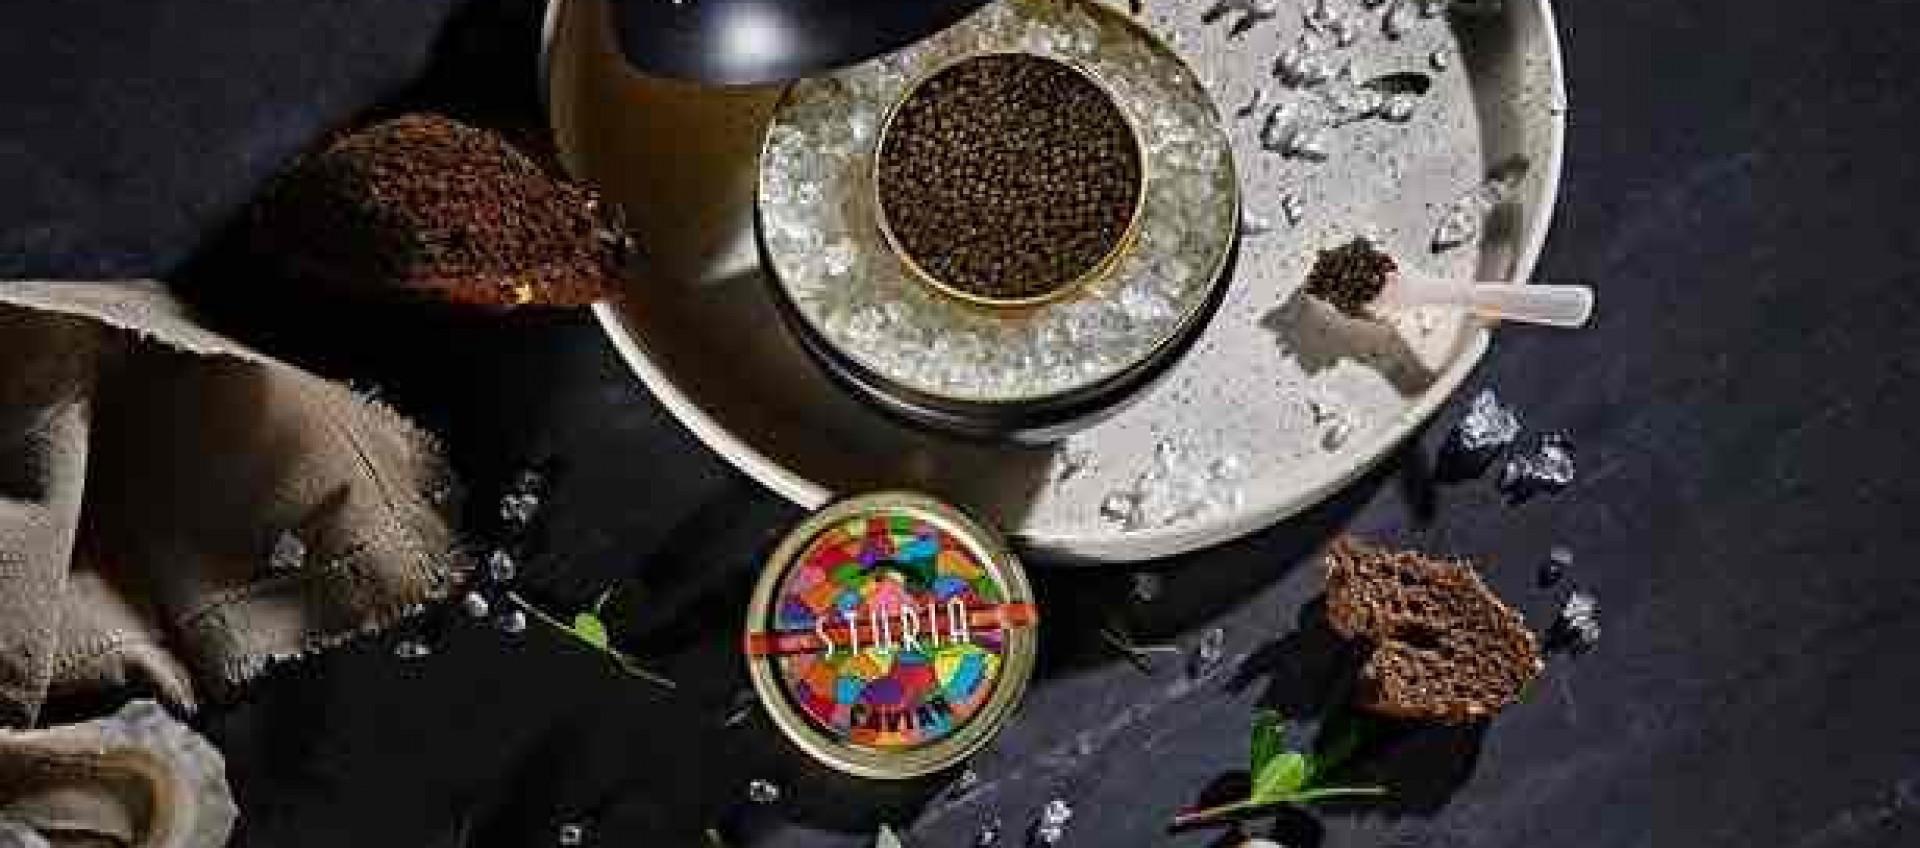 PROMOTION -30% Caviar Sturia en boutique